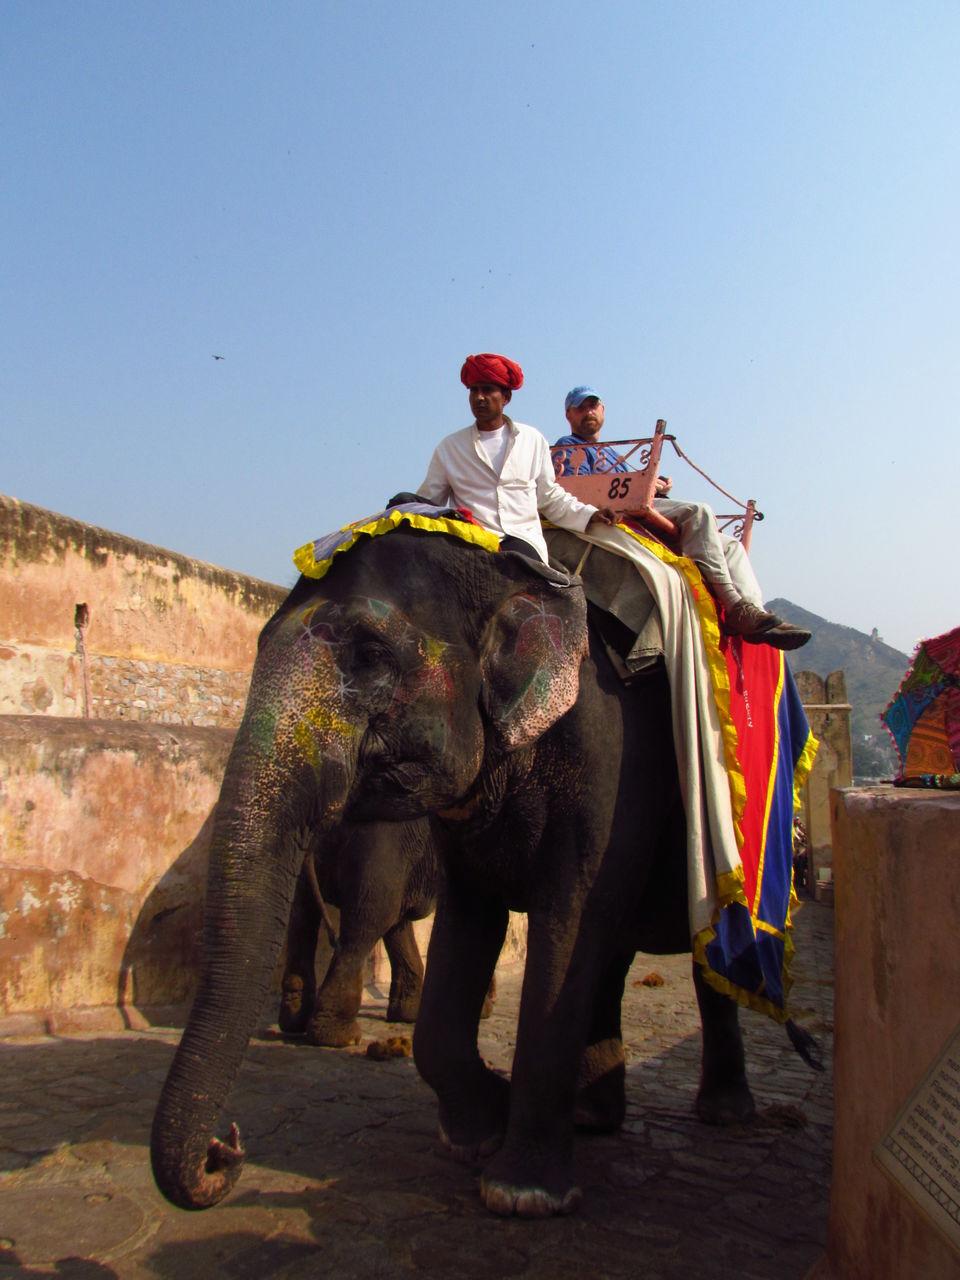 Photos of Elephant ride @ Amer Fort, Jaipur 4/24 by Prahlad Raj